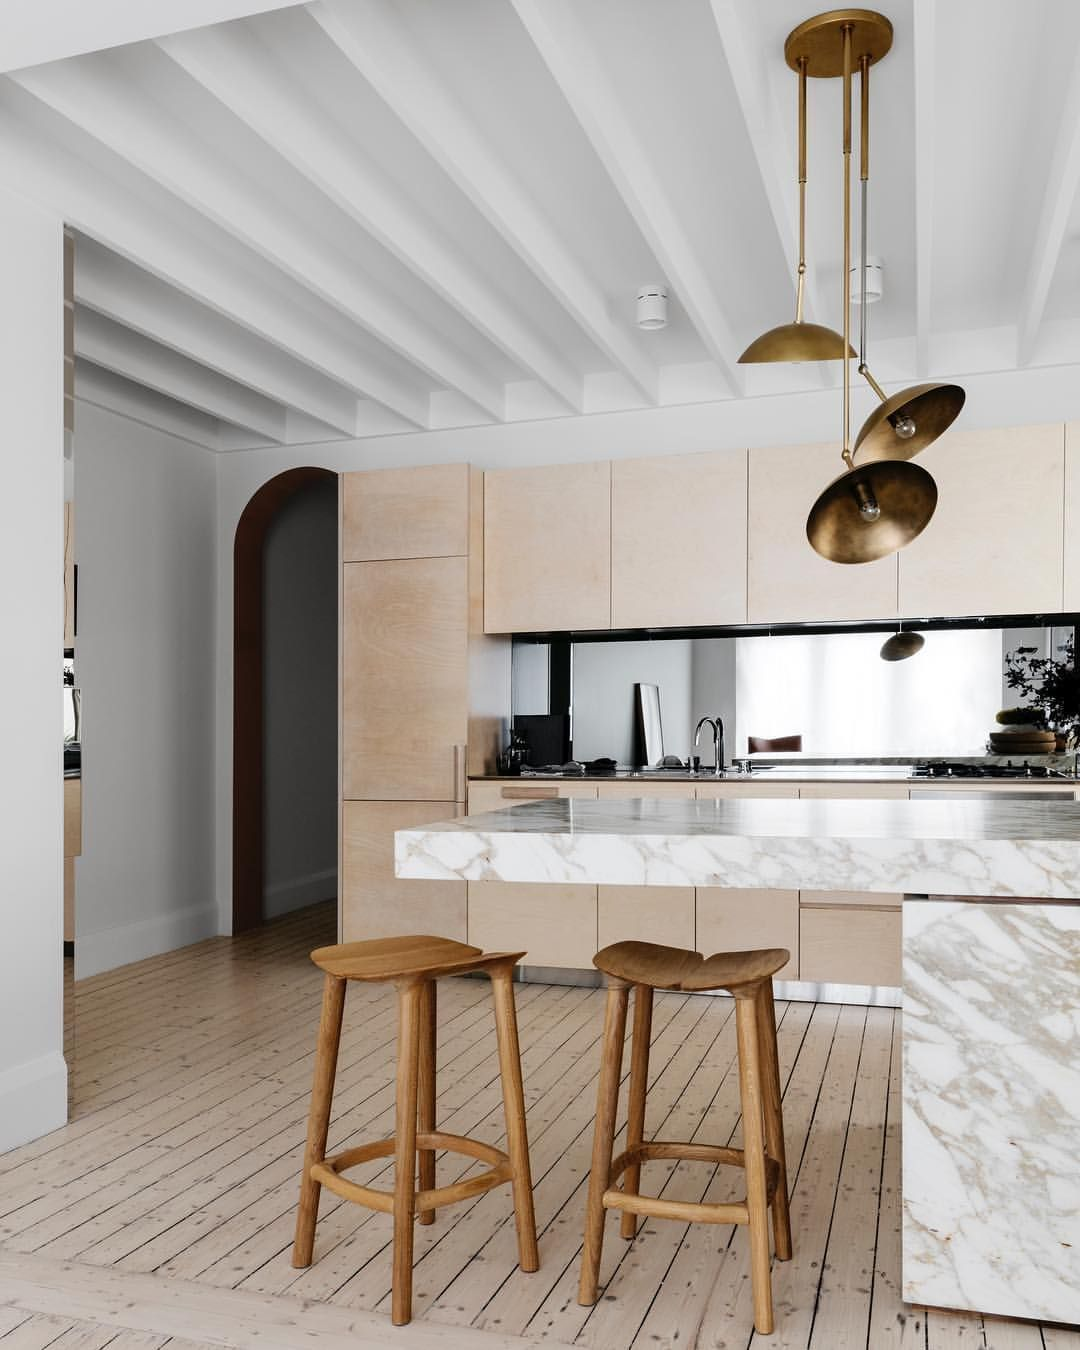 Inside Apartments Cheap: Inside @chroniclesofher_ Influencer @carmengracehamilton's